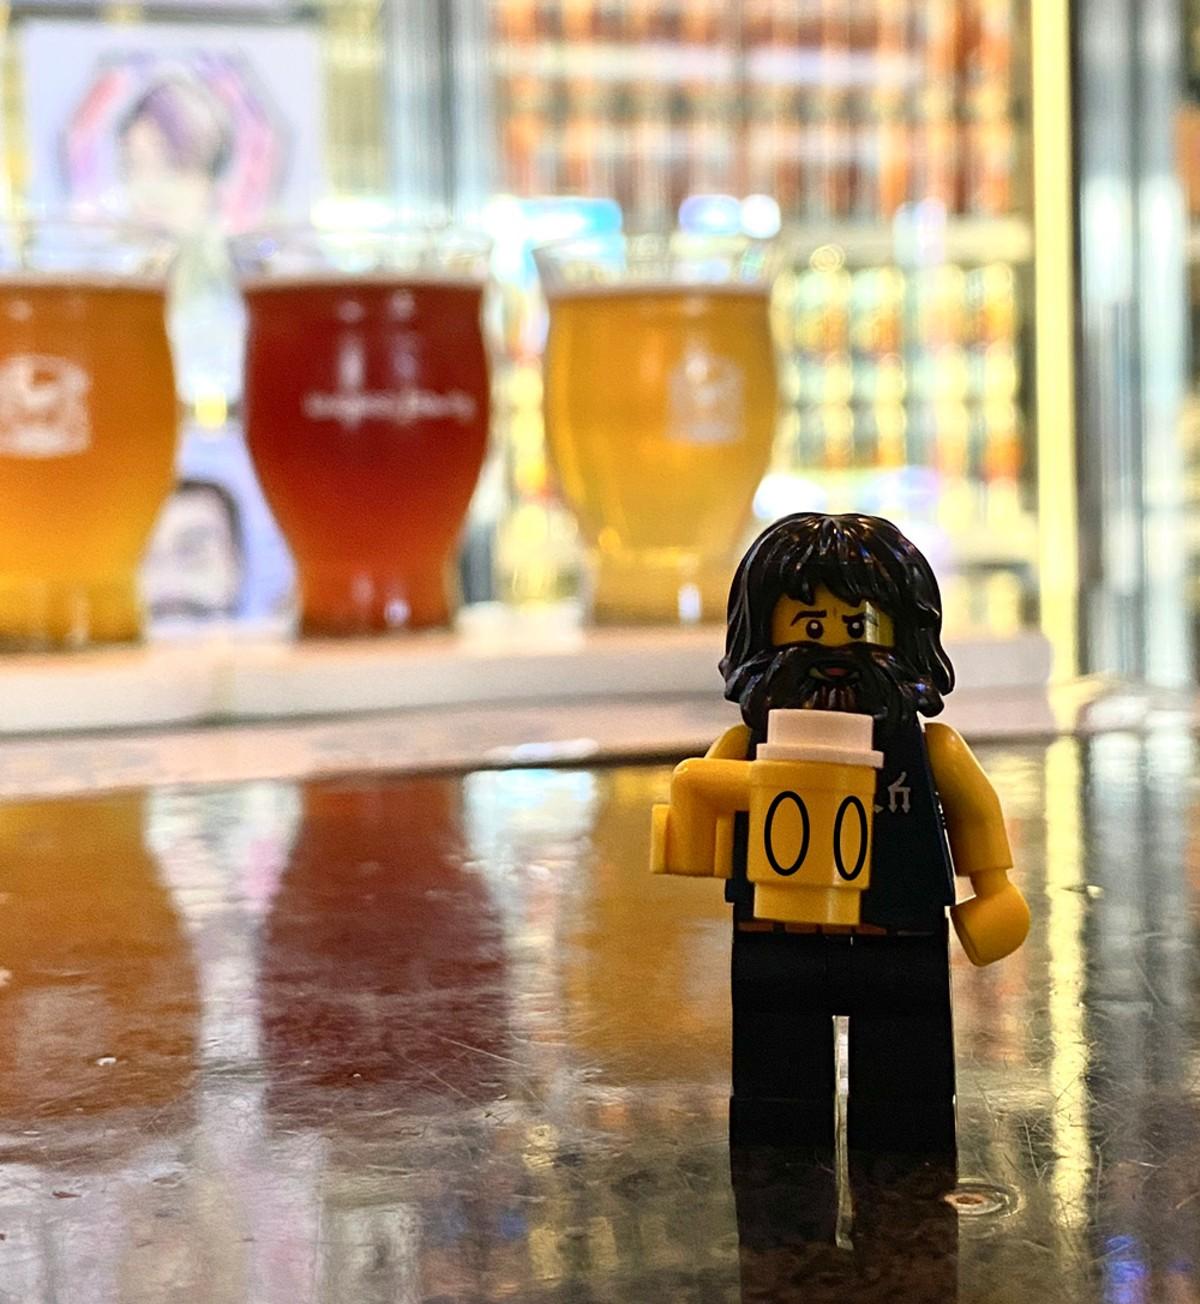 hourglass-brewing-1000.jpg